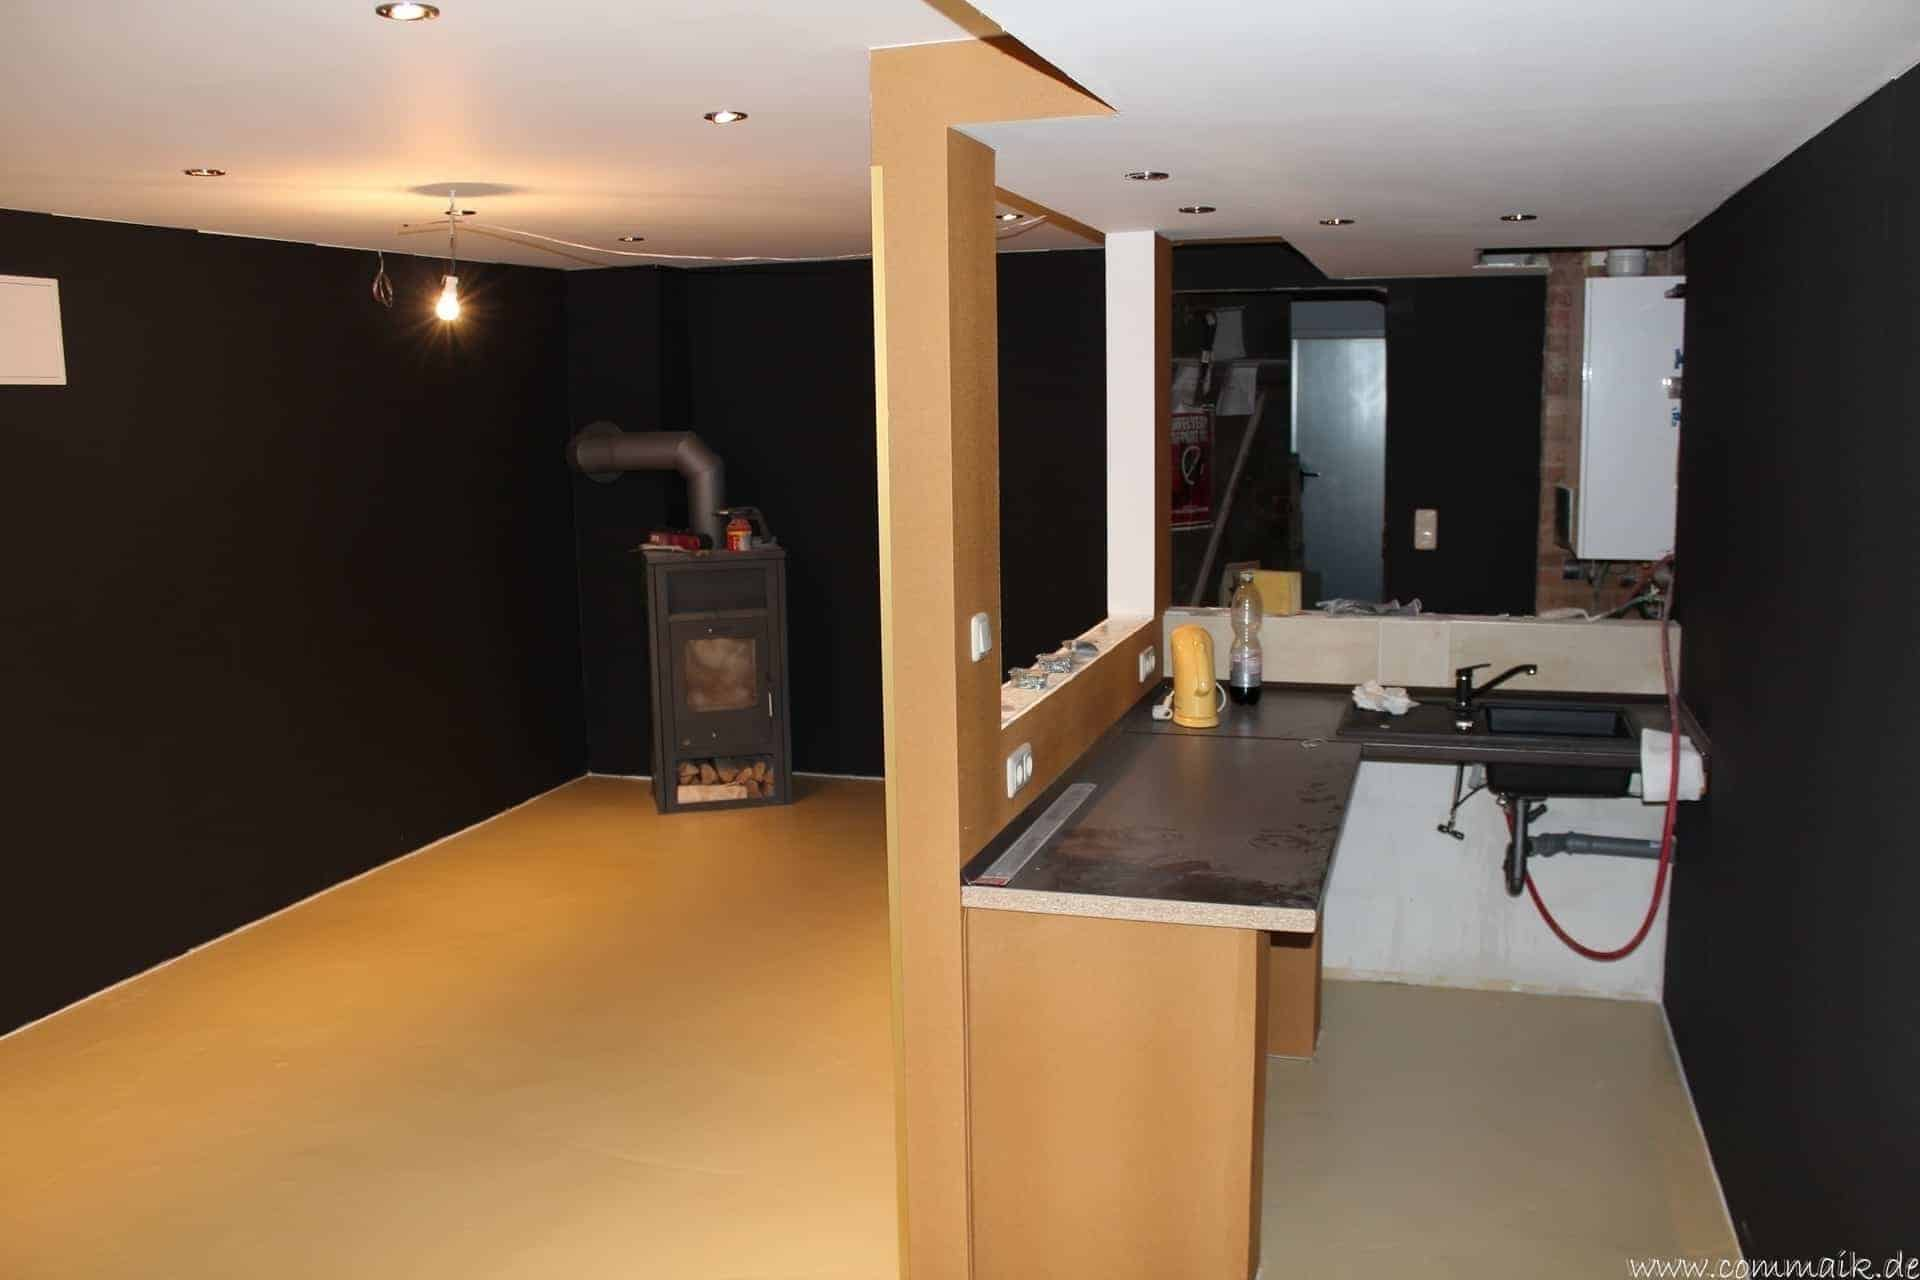 Wohnung Malern Ideen – sehremini